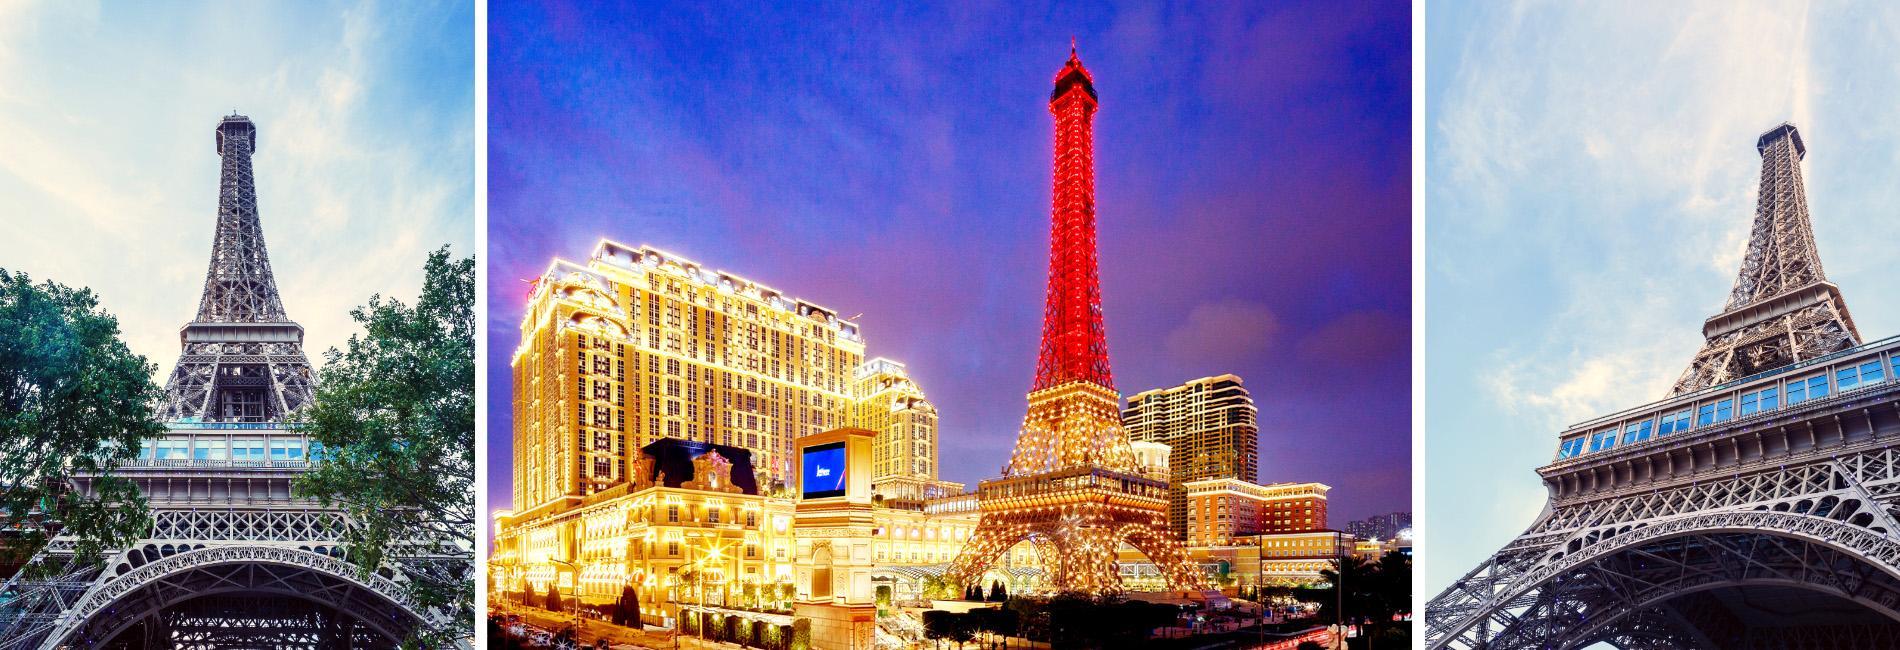 Eiffel Tower Experience E Voucher Kkday Tiket Cotaijet Ferry Round Trip Hongkong Macau